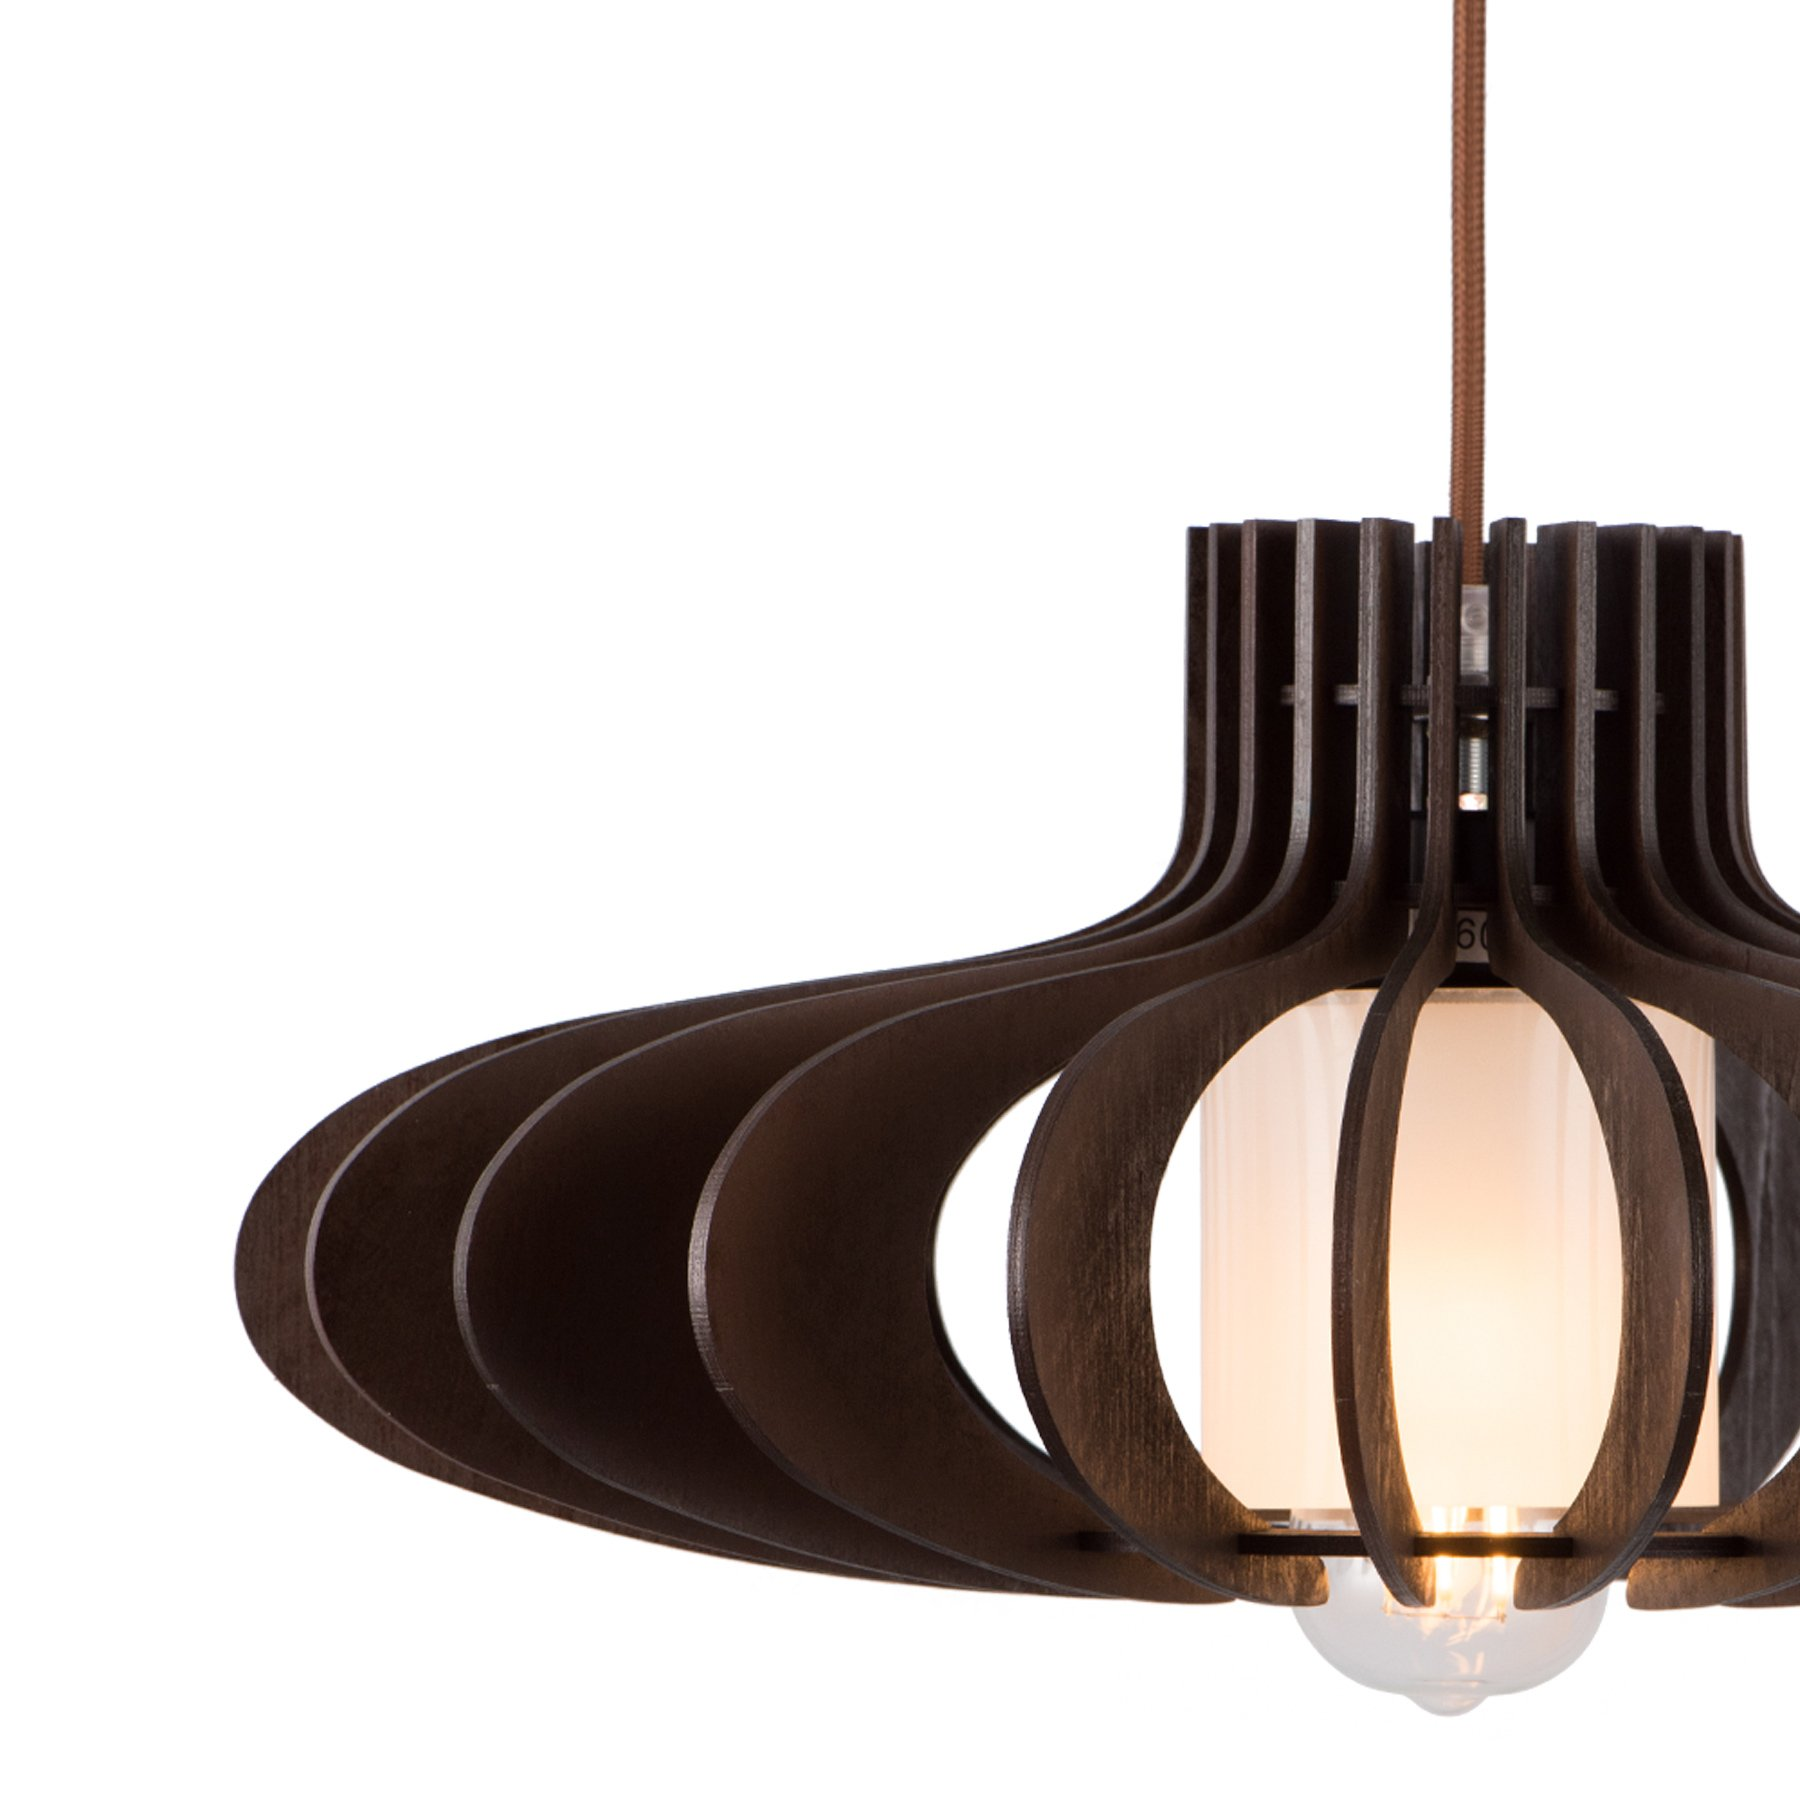 MAYKKE Oban Medium Wooden Pendant Lamp   Lantern Style with Dark Brown Rings, Hanging Light with Adjustable Cord   Walnut Wood Finish, MDB1040201 by Maykke (Image #5)